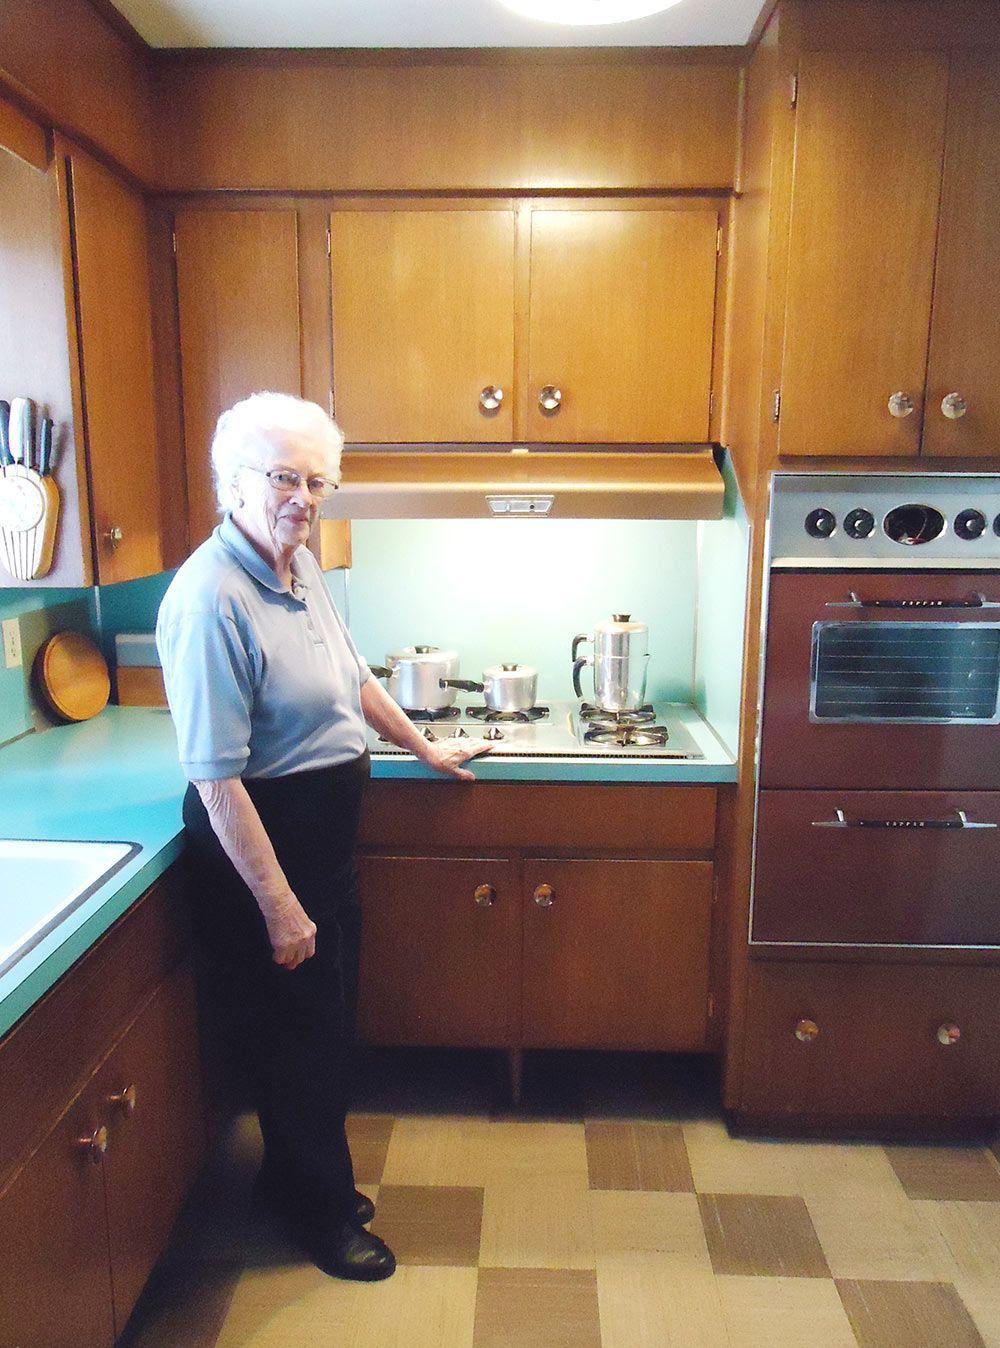 58 Ans Dans La Meme Cuisine 1958 Mere De Judy De Cuisine Doreen Calgary In 2020 Retro Renovation Mid Century Modern Kitchen Retro Kitchen